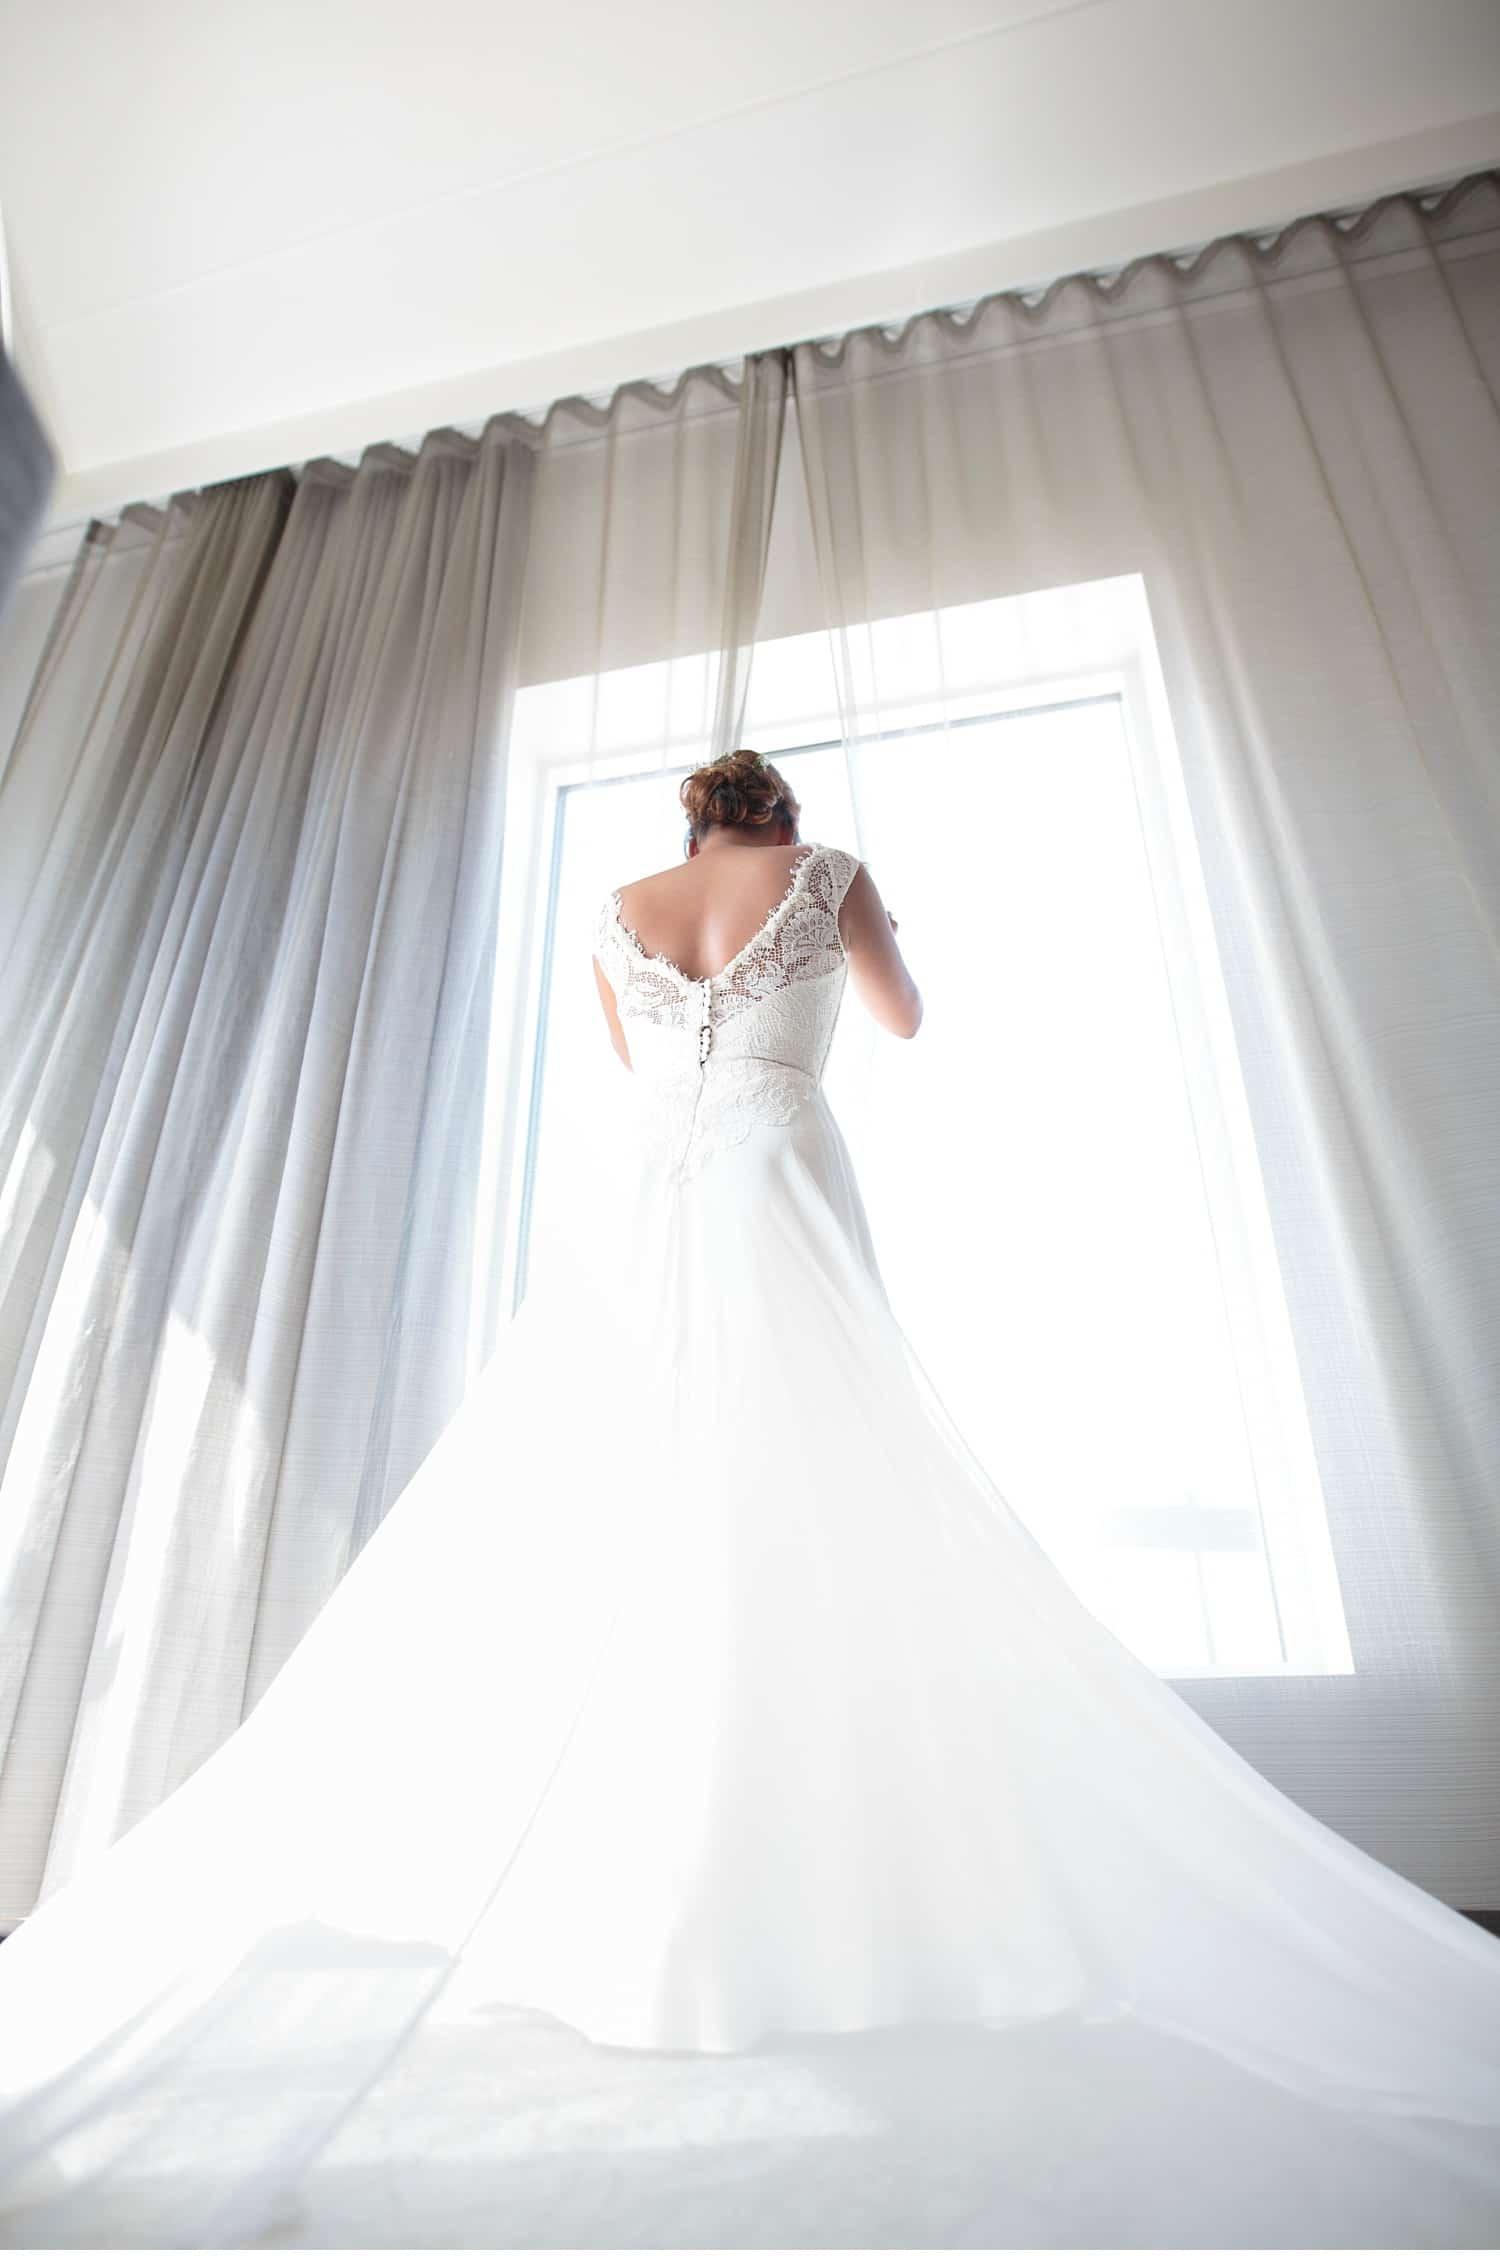 linnea johan 102 - Linnea & Johan Hedberg's Wedding wedding